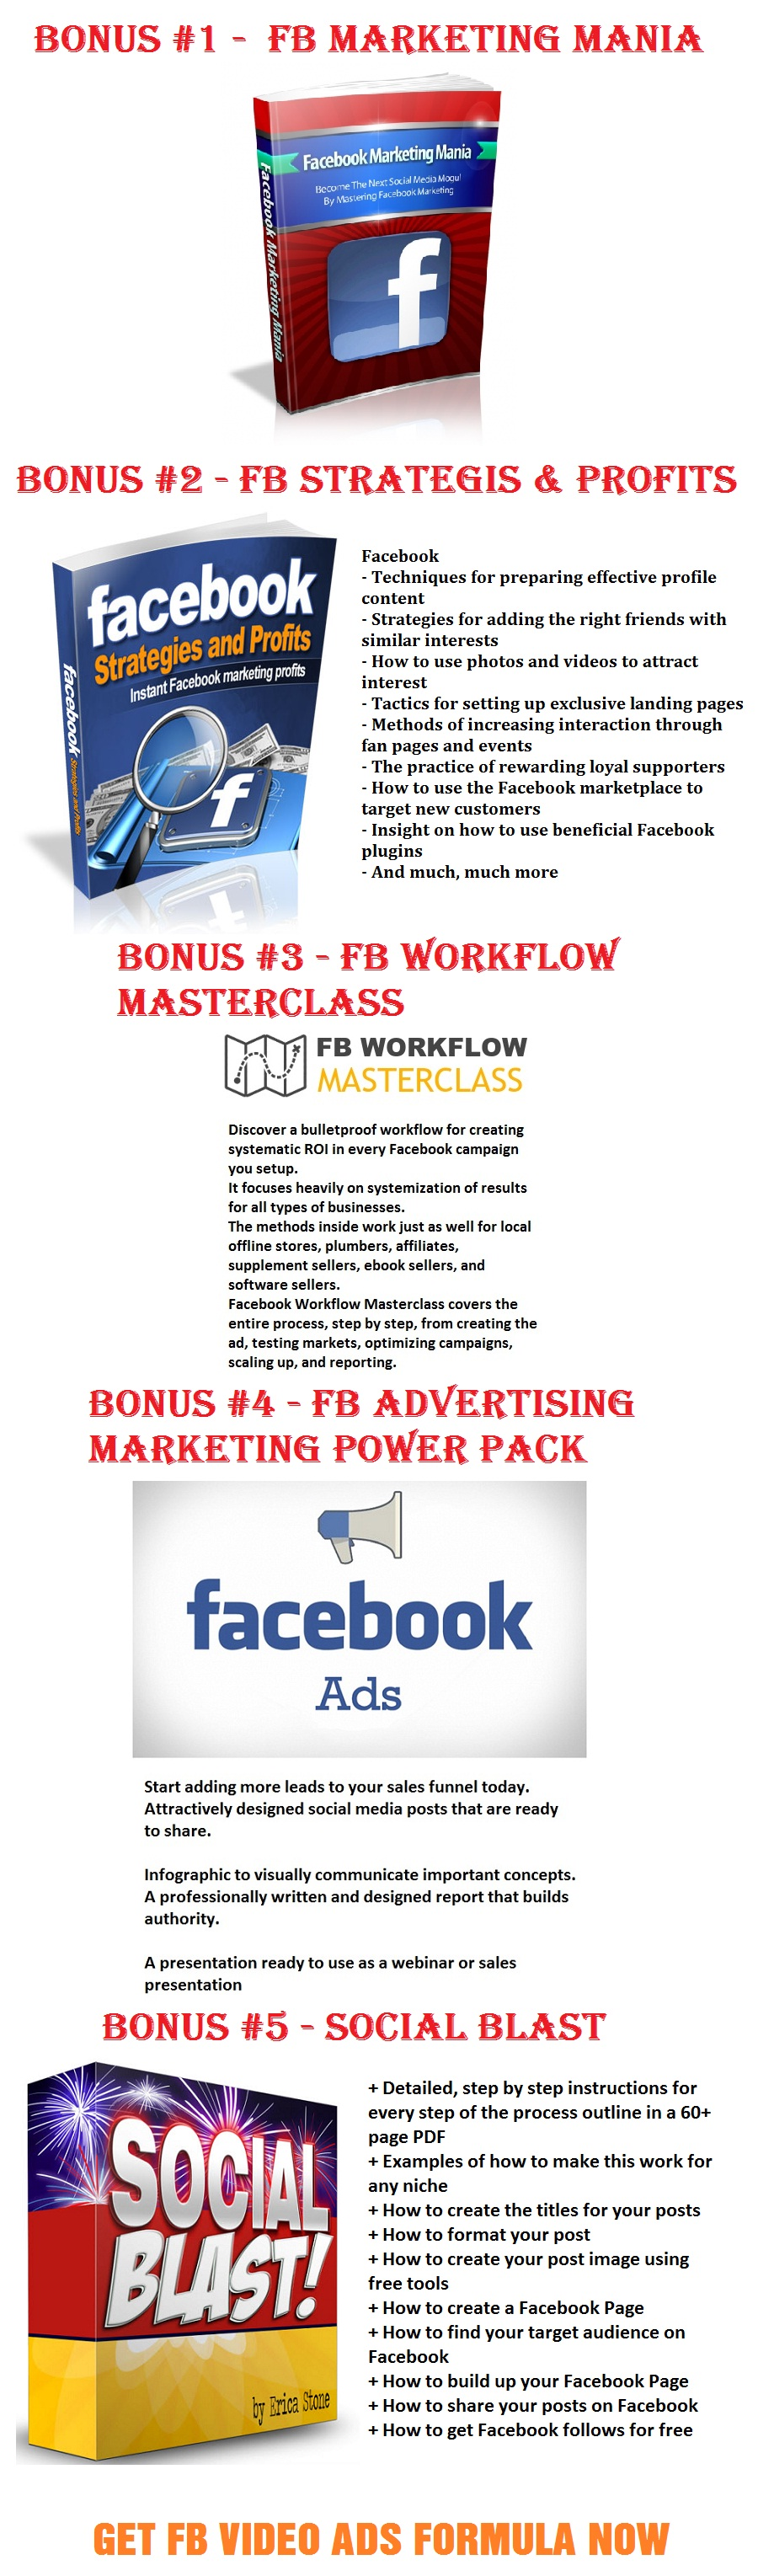 FB Video Ads Formula Bonus